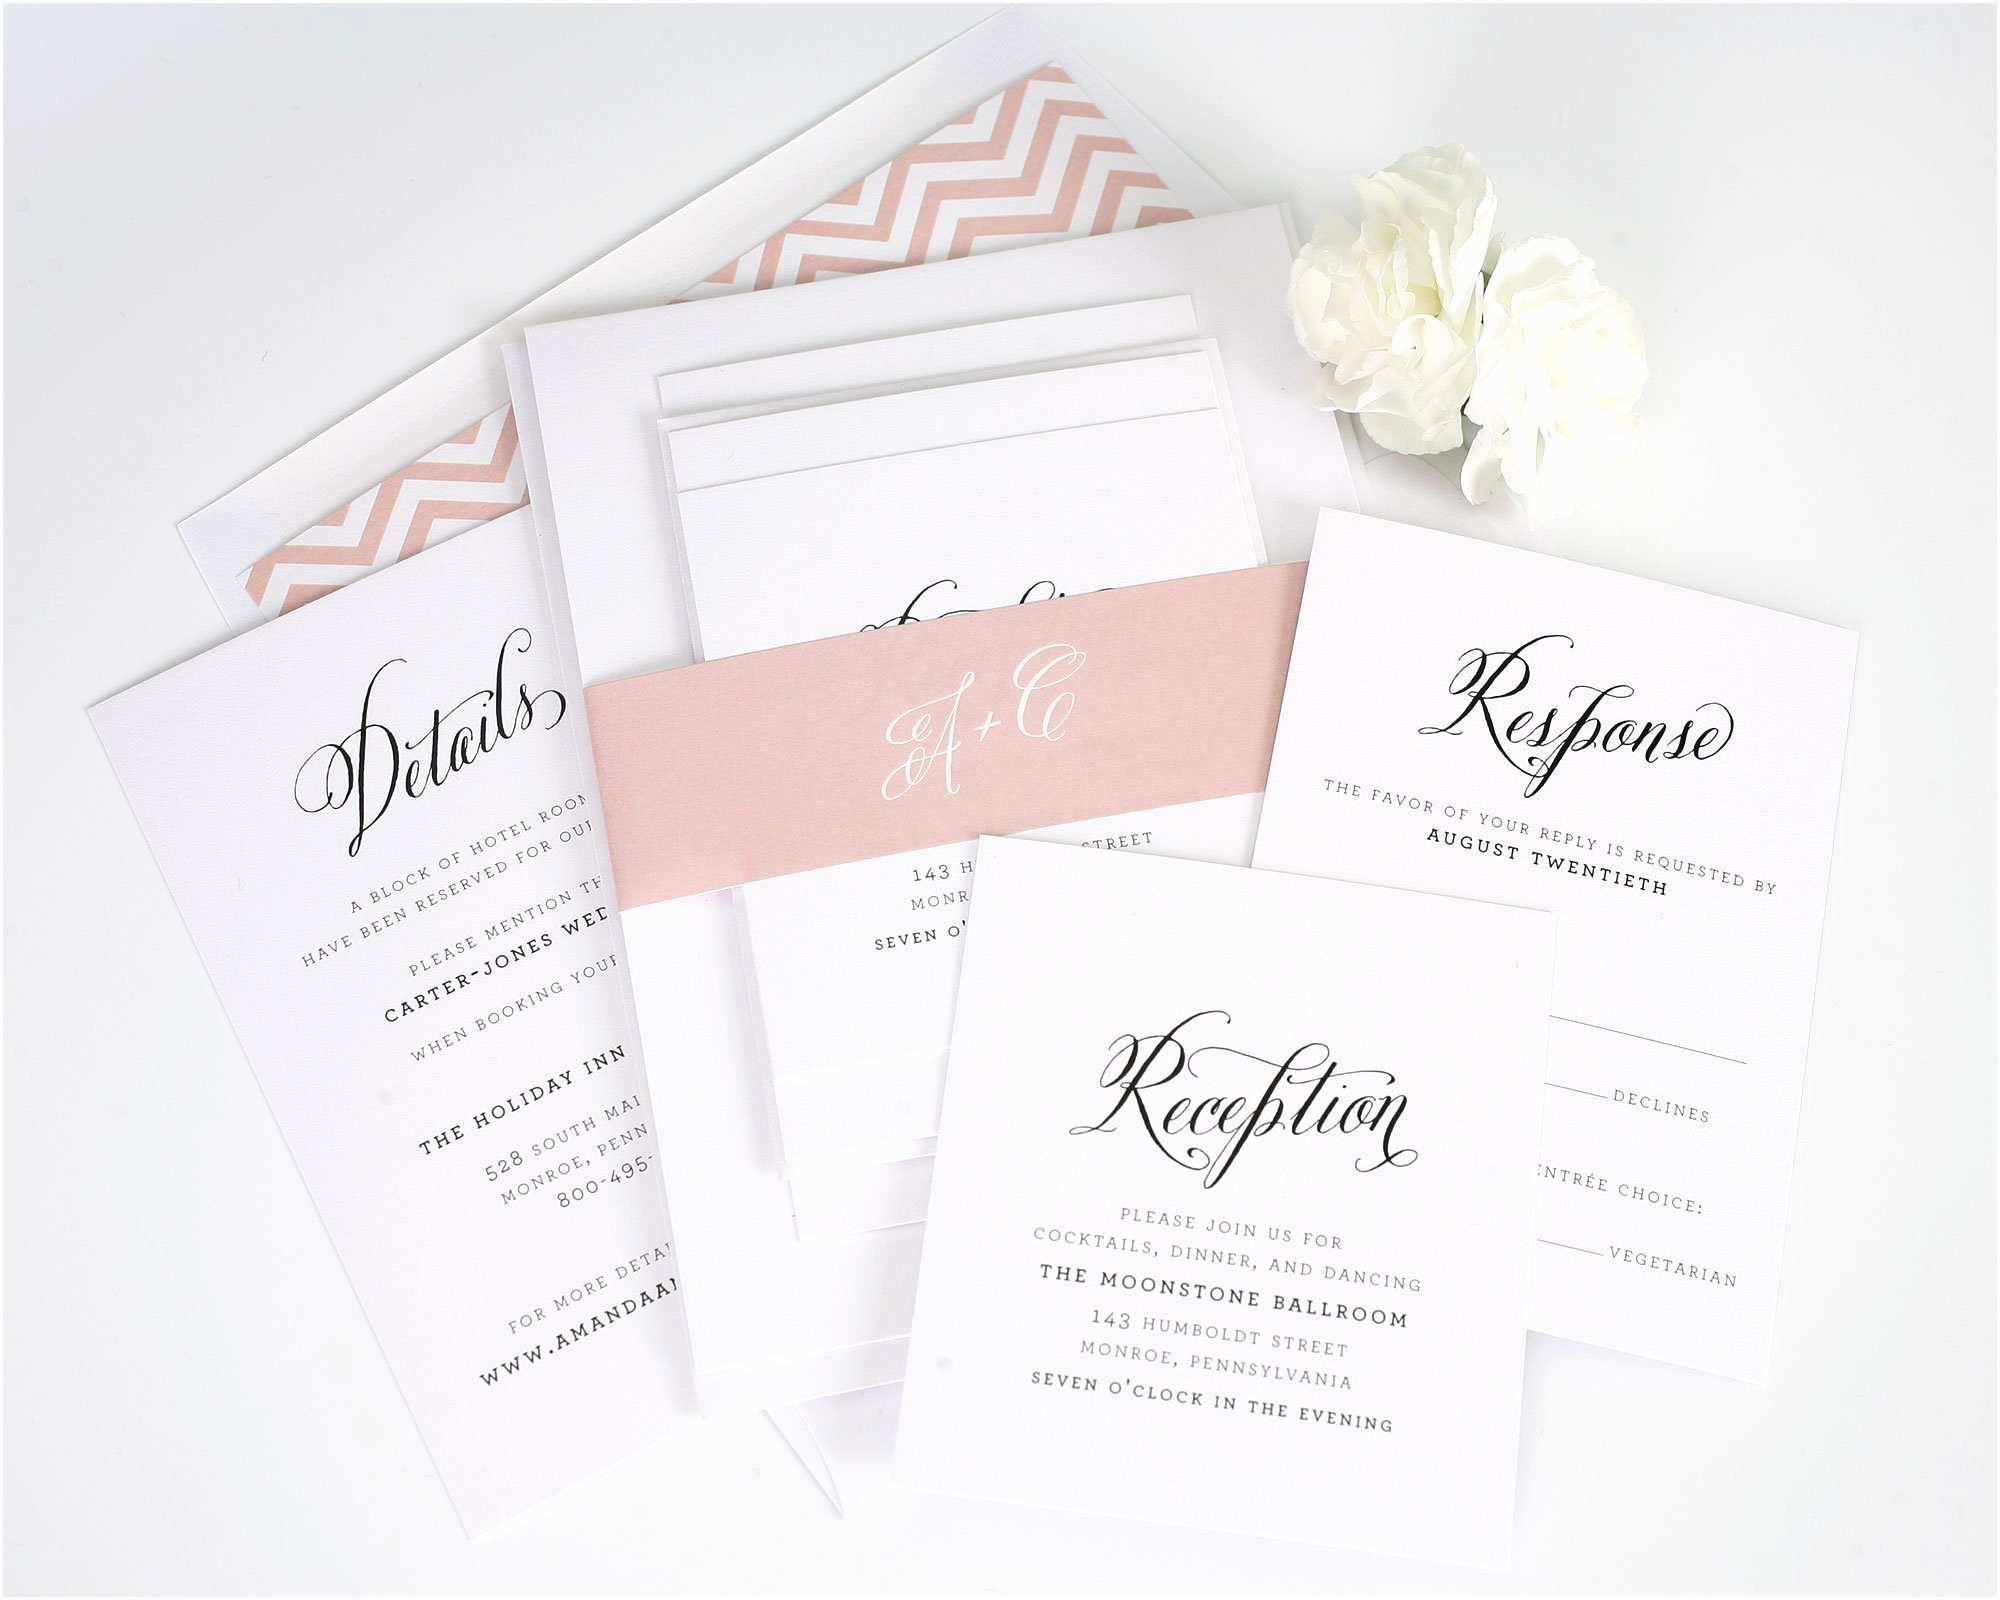 Large Wedding Invitations Rustic Wedding Invitations with Blush Chevron Accents